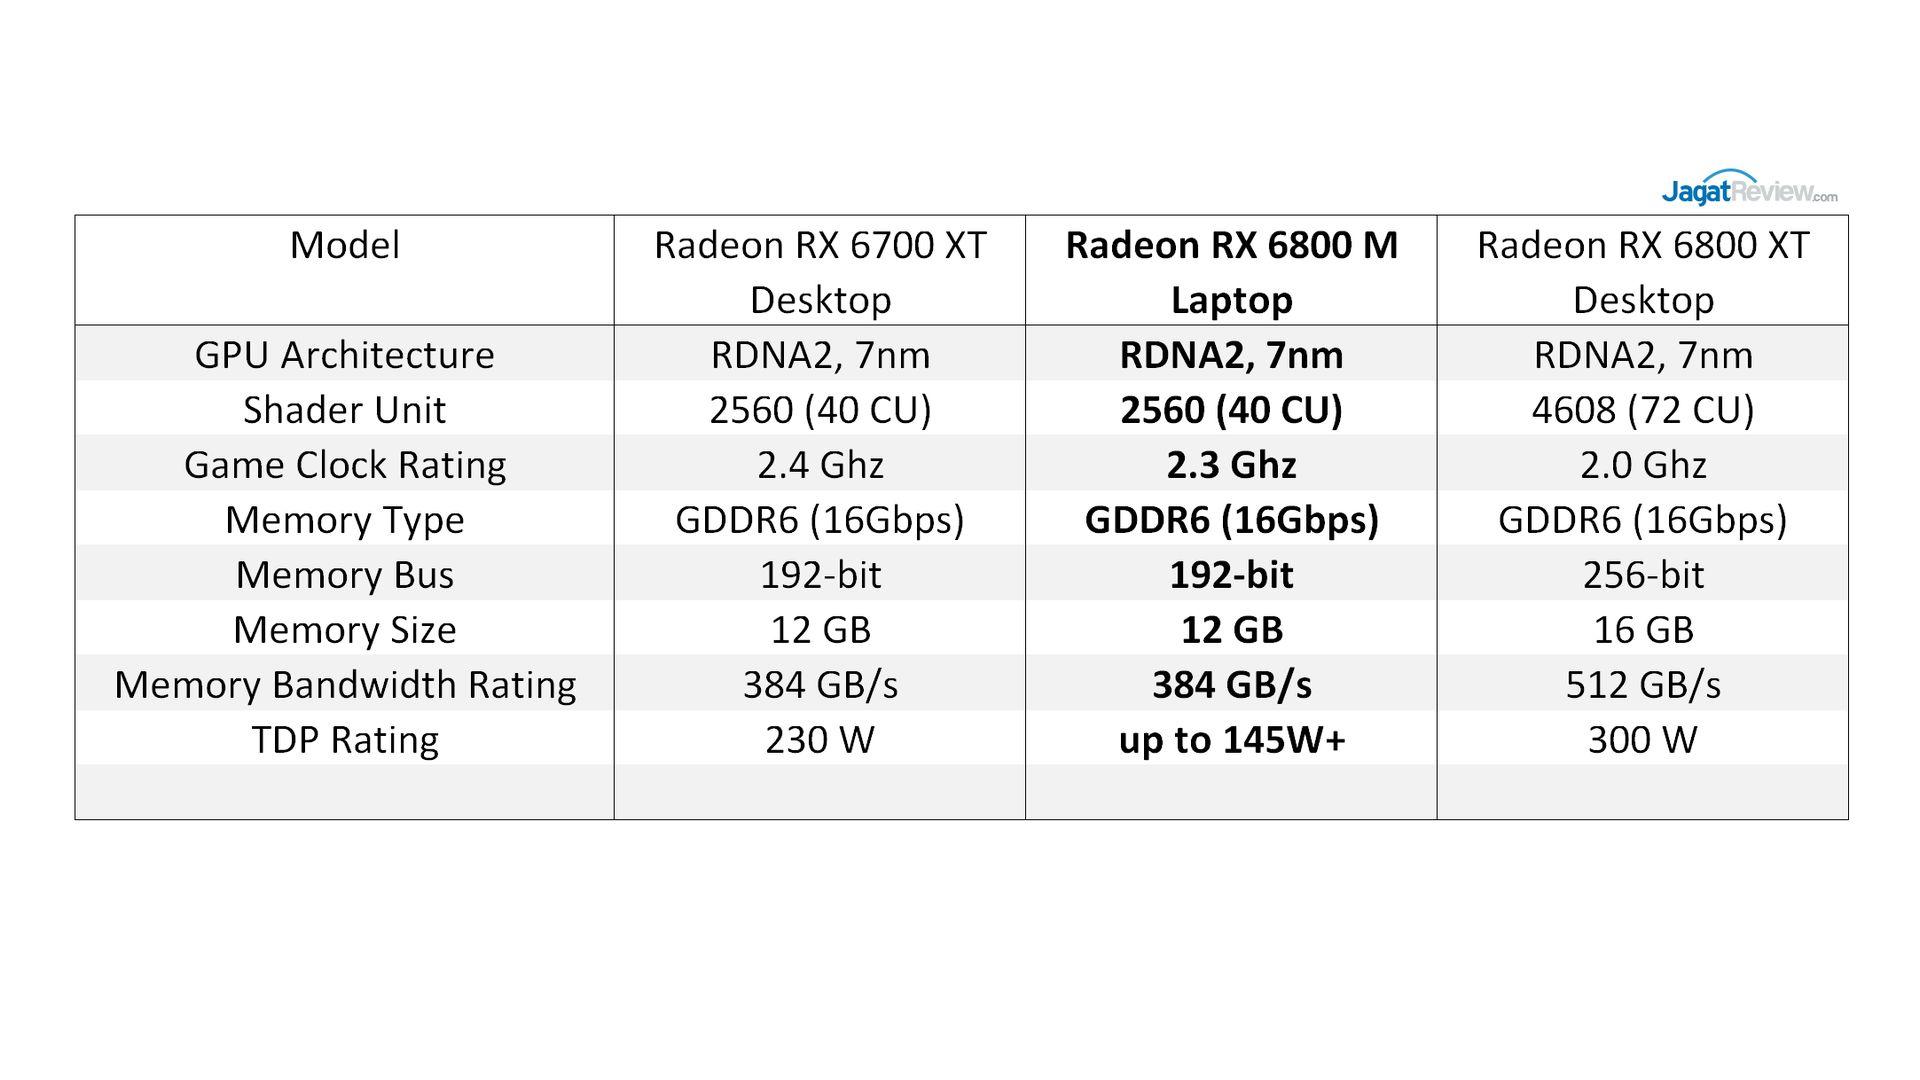 HW RX6800M 2 Table